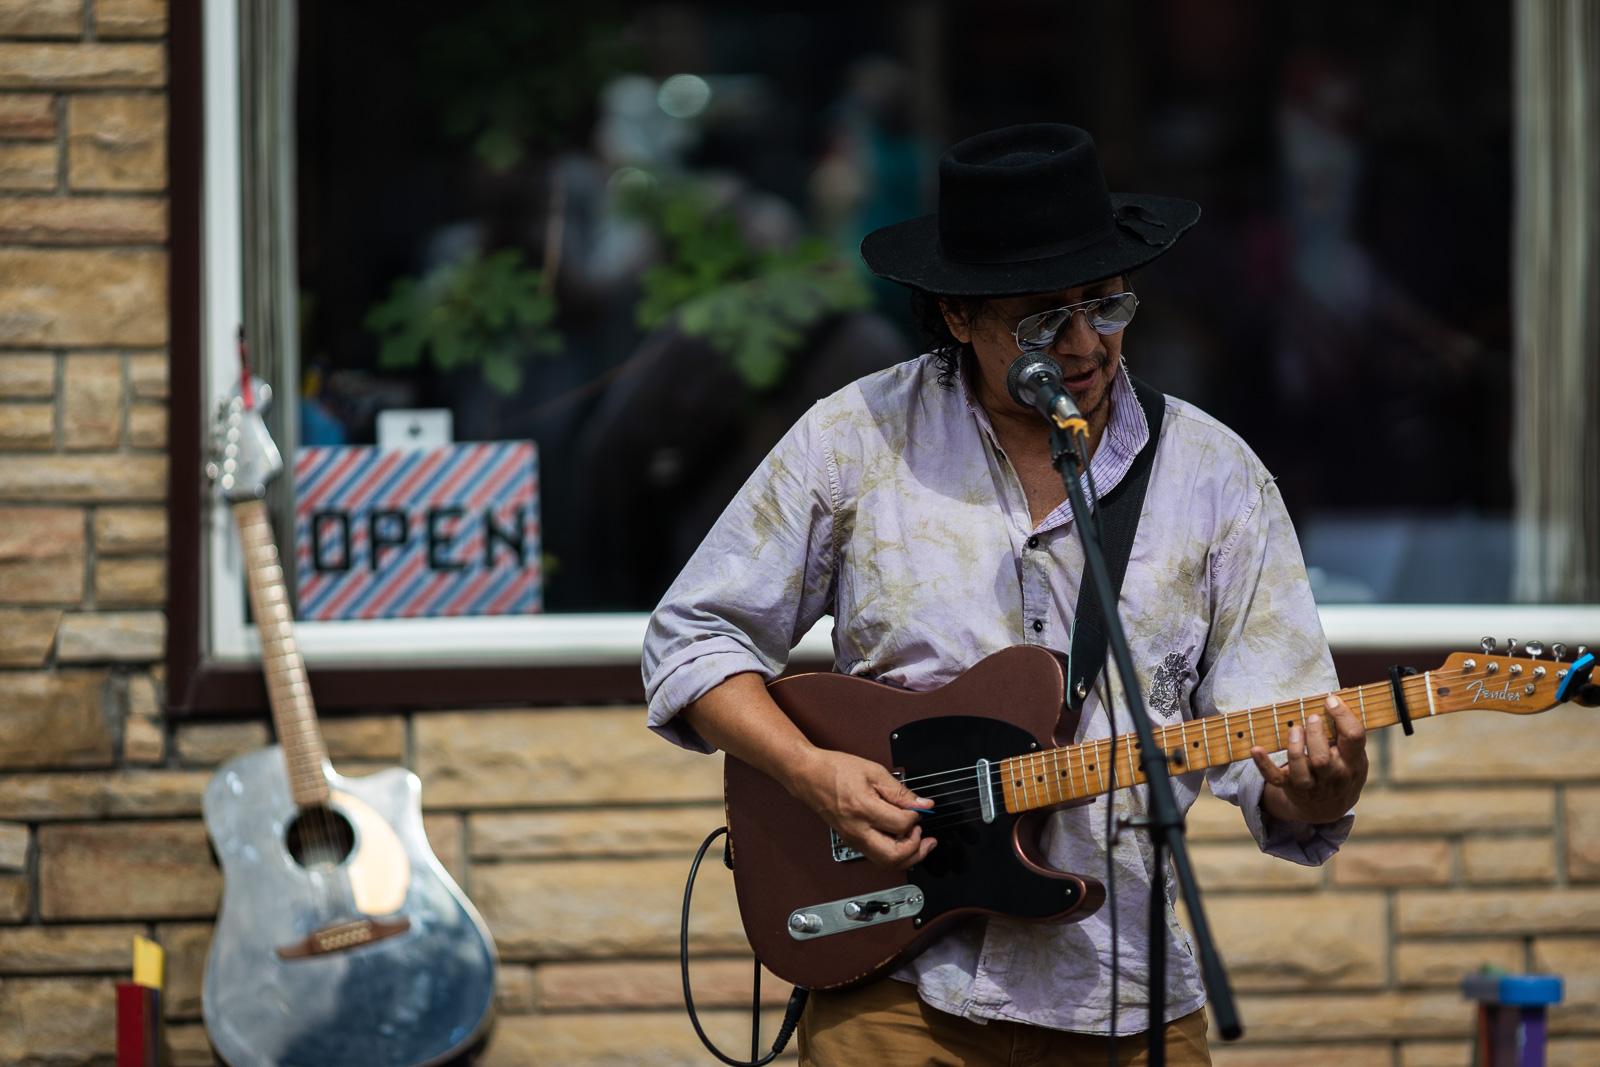 7th-annual-buskers-festival-blog-45.jpg